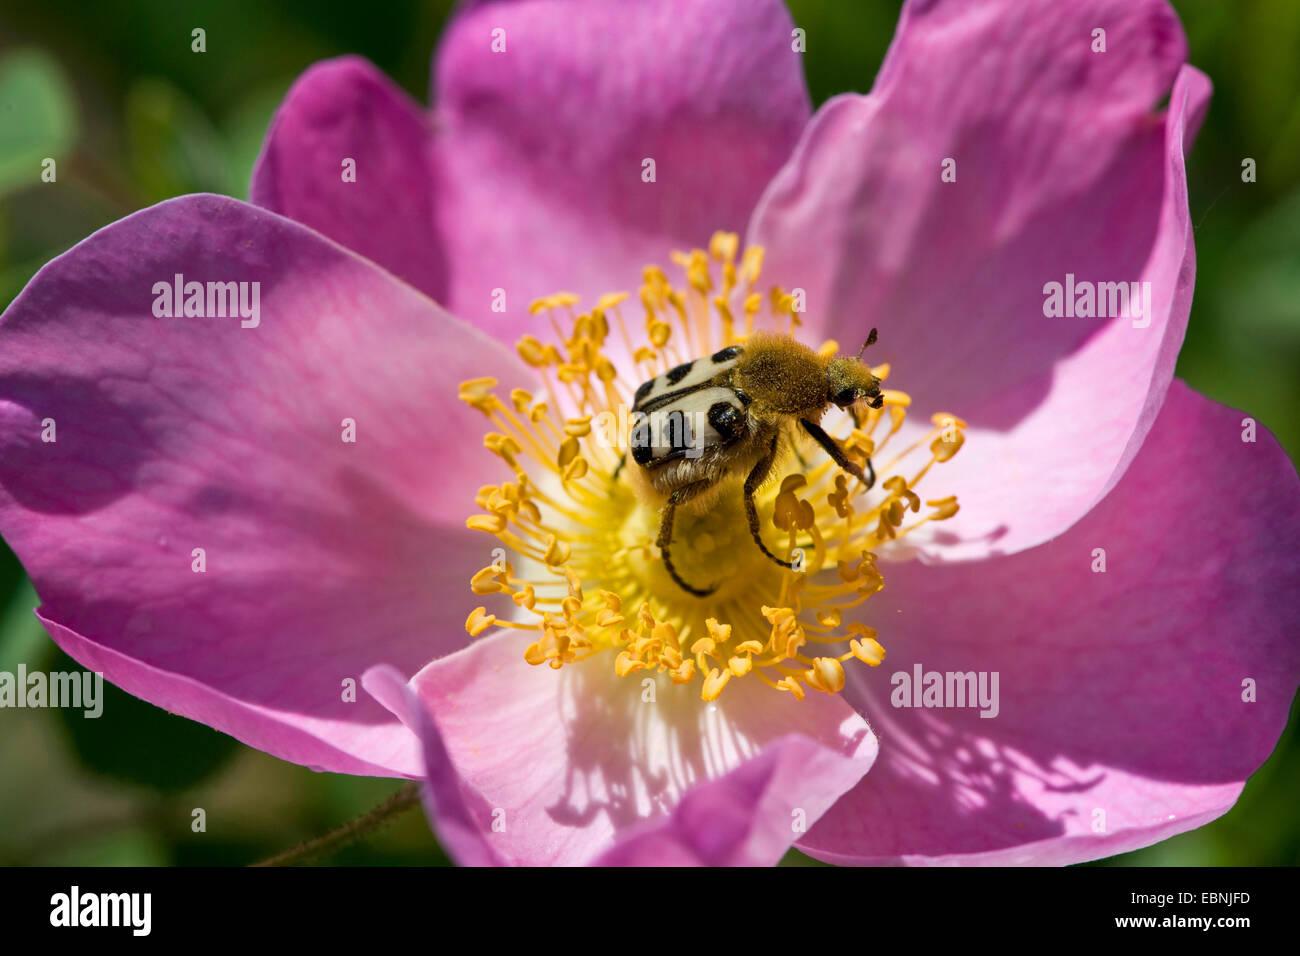 bee chafer, bee beetle (Trichius fasciatus), on Rosa gallica, Germany - Stock Image